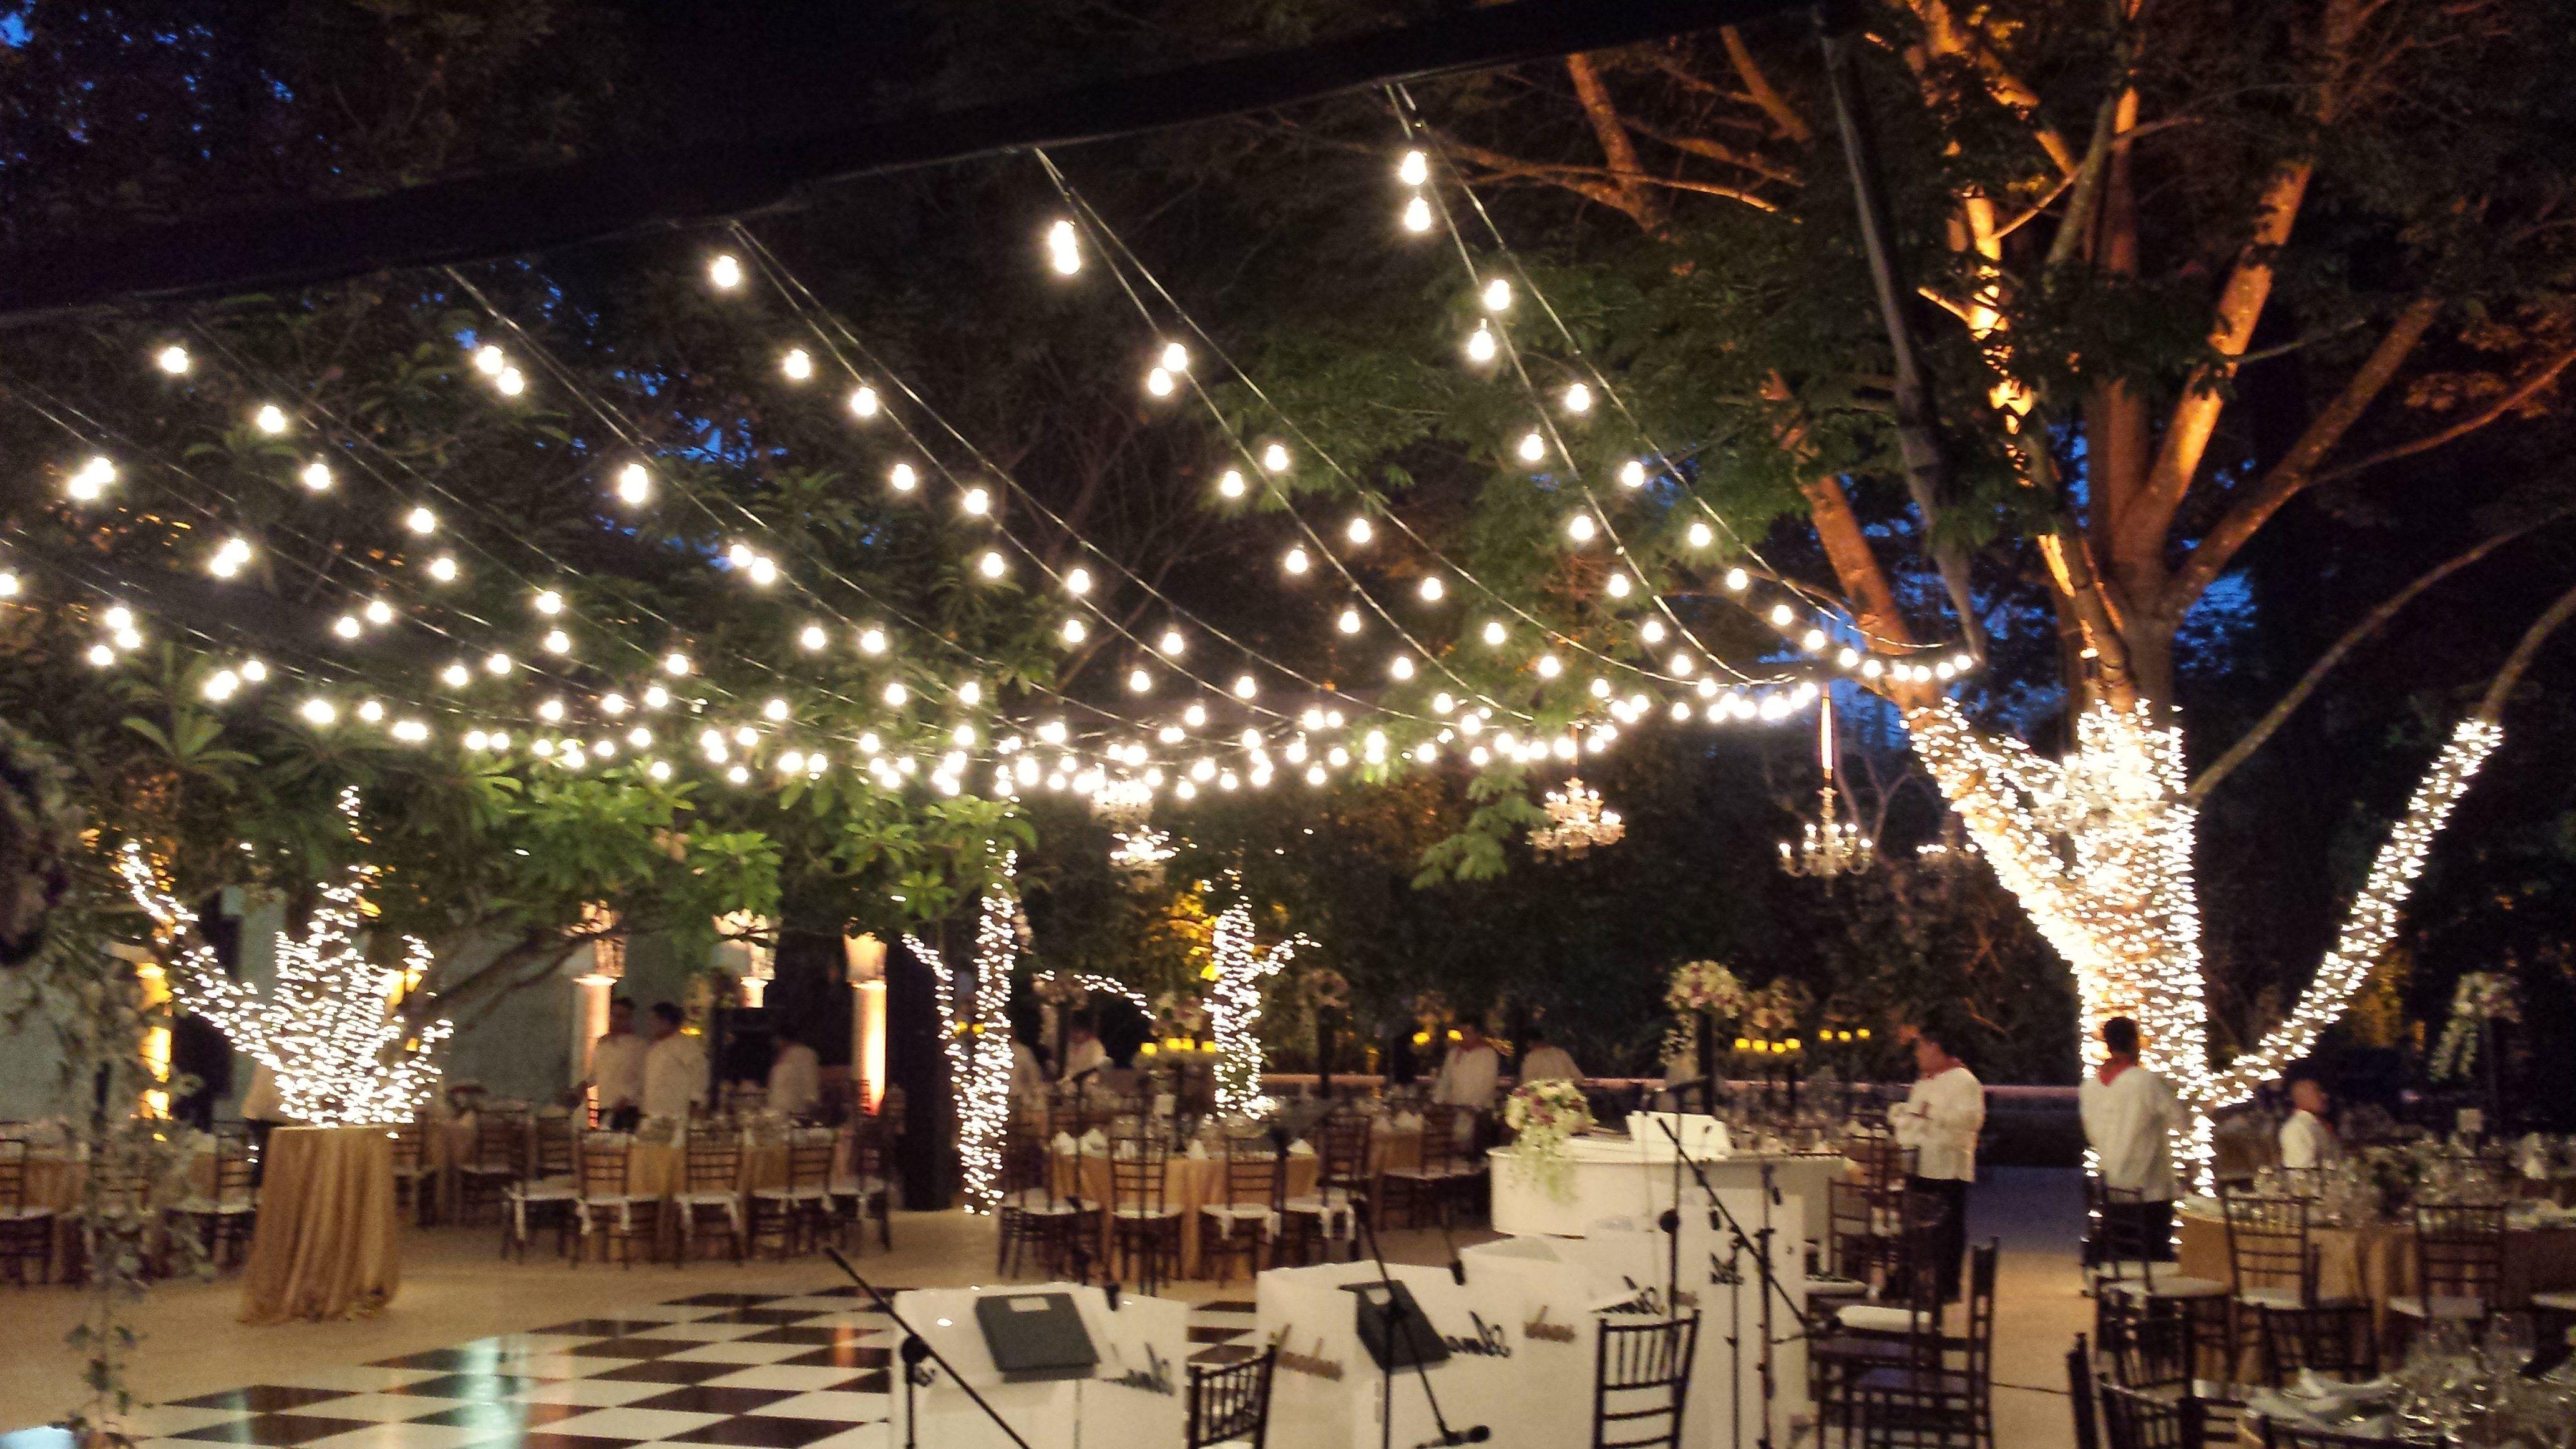 Big Bulb Outdoor String Lights